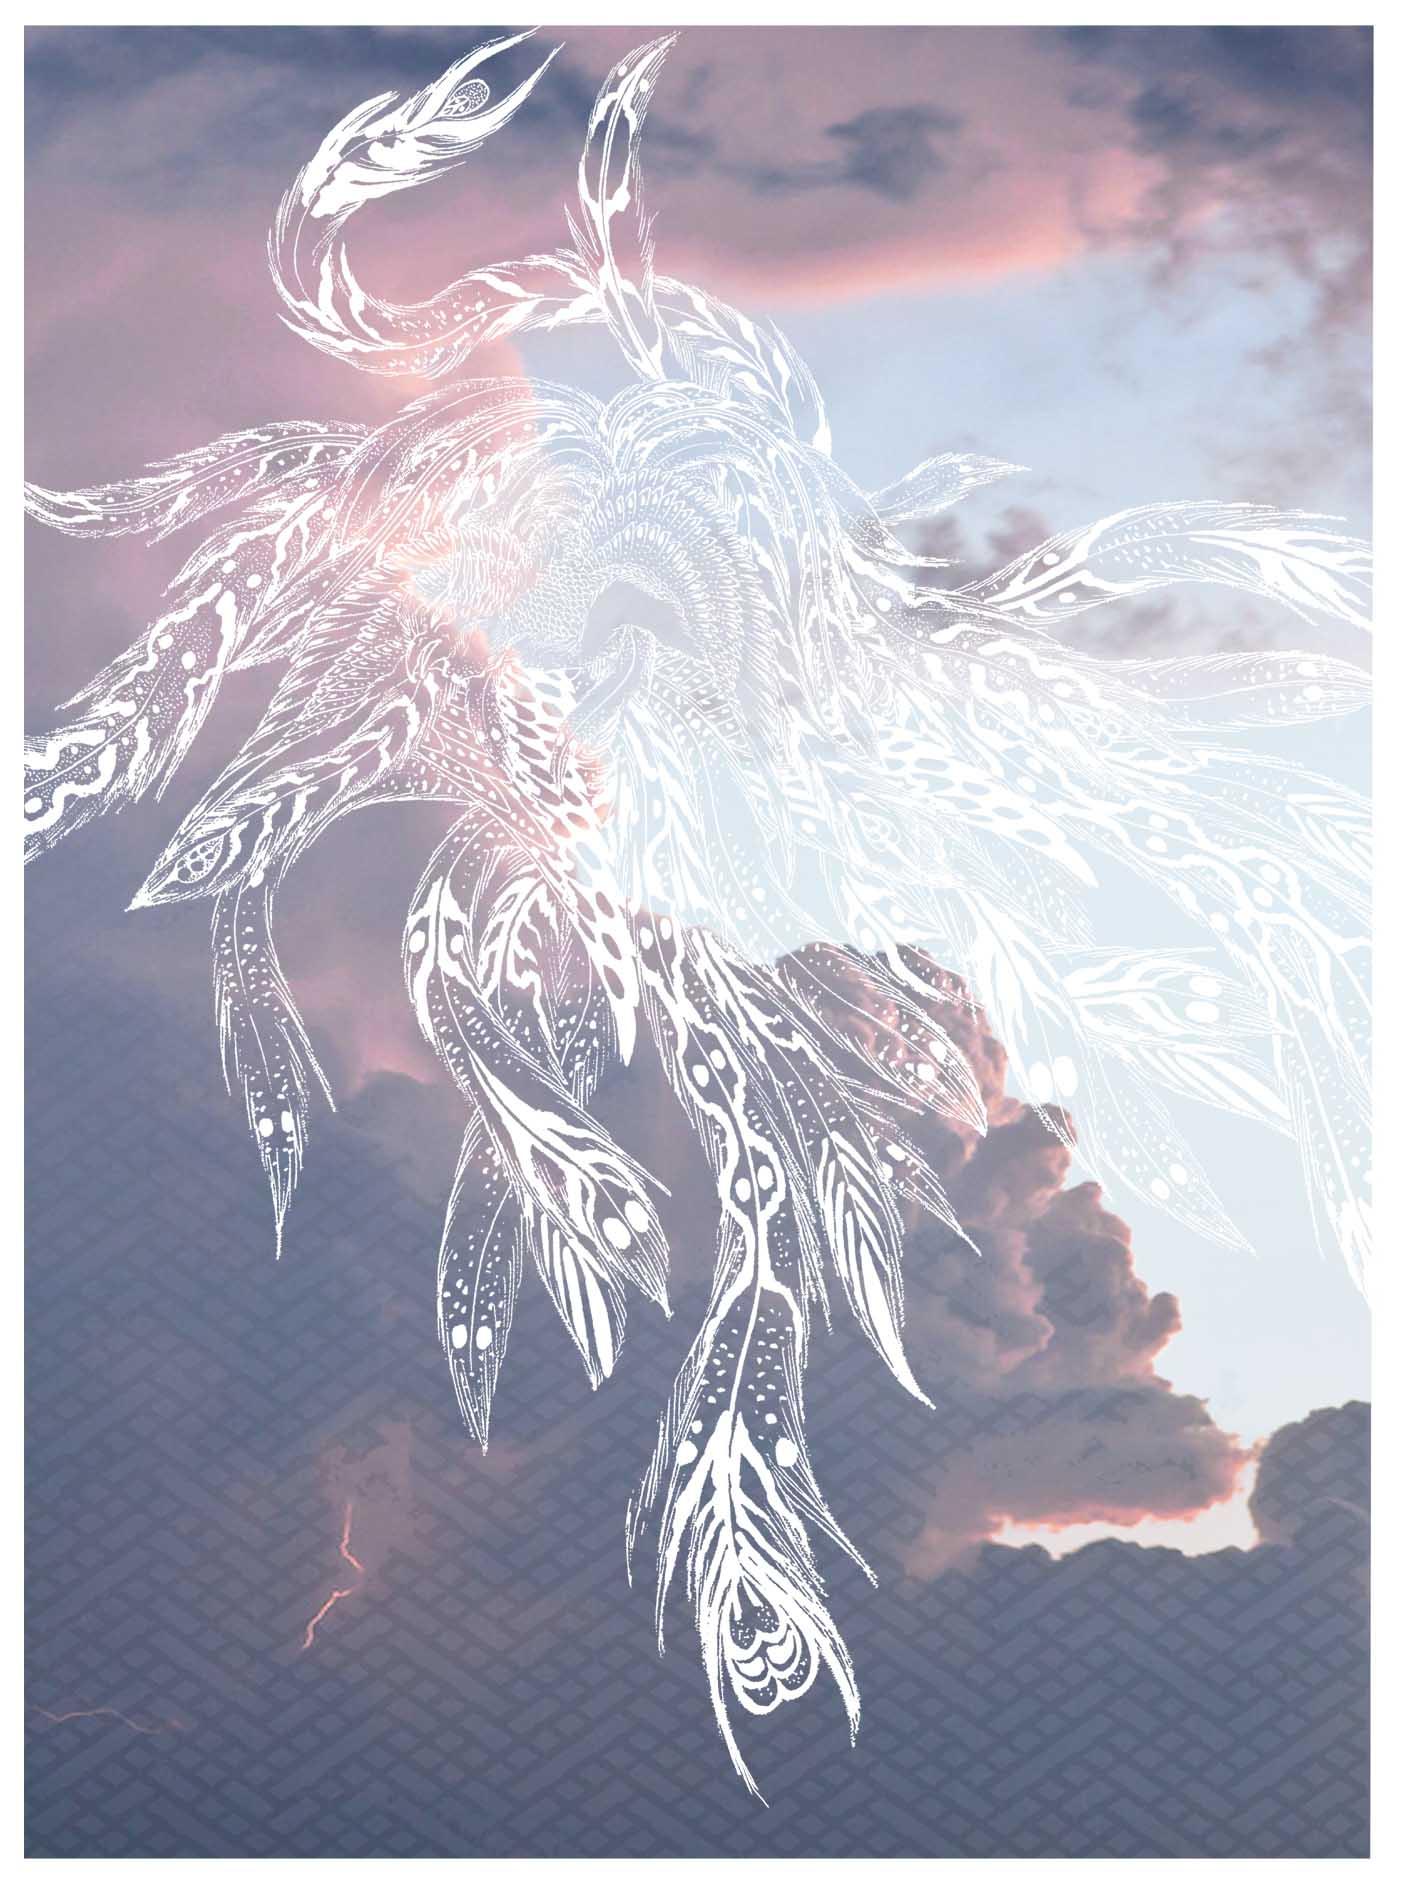 Phoenix Cloud Print - Horiyoshi The Third X Bella Gomez